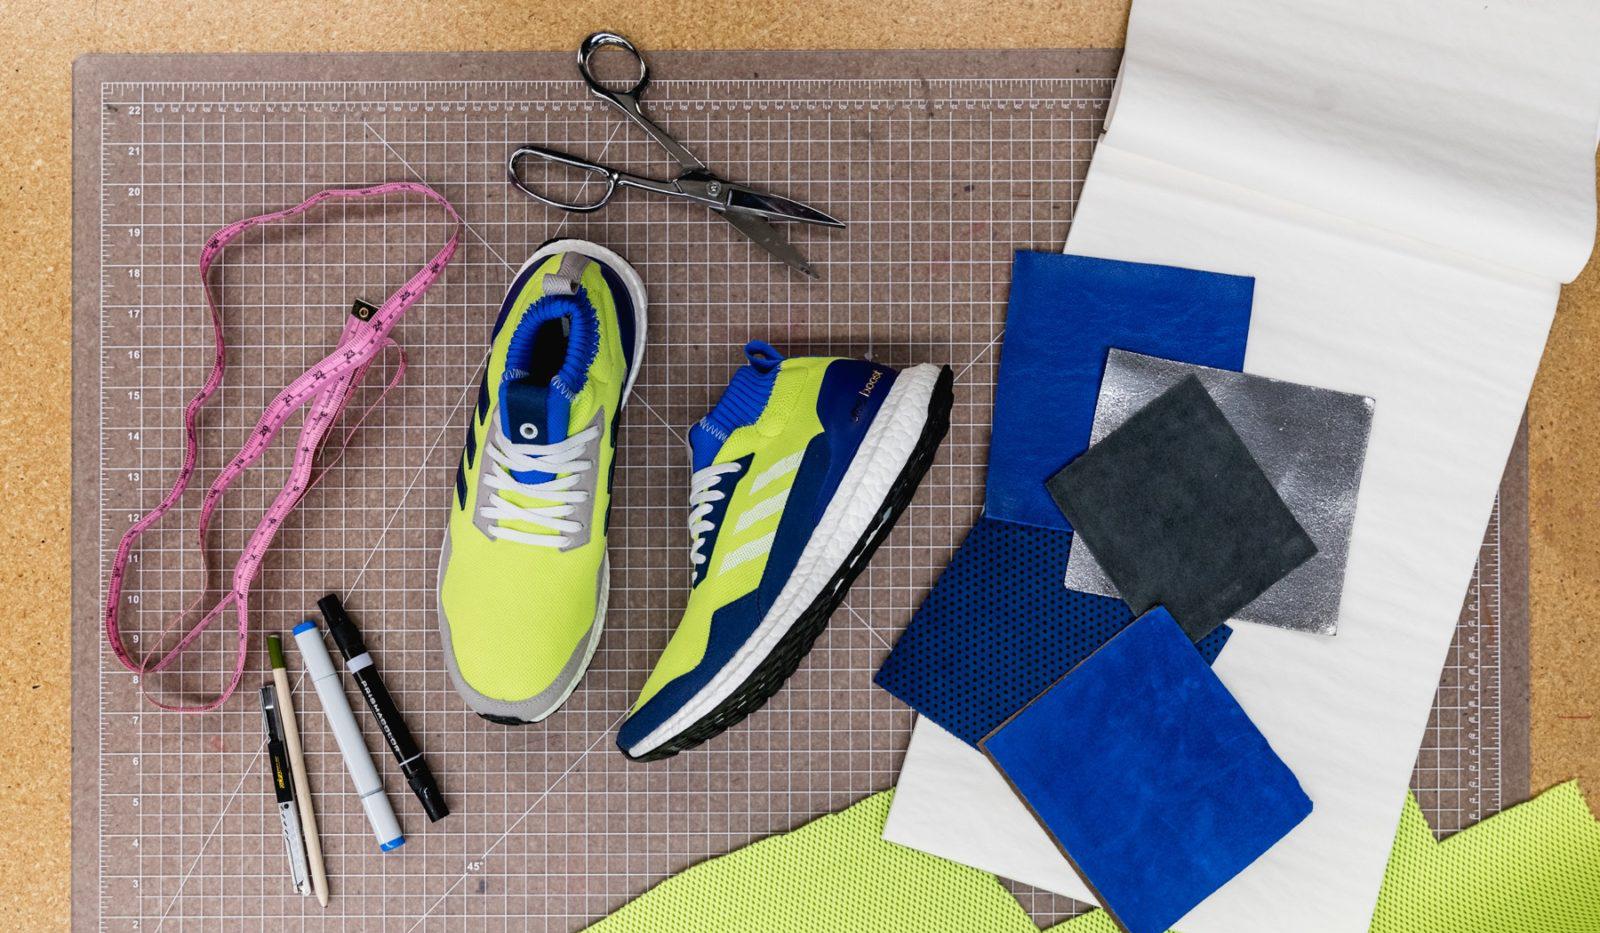 adidas-consortium-ultraboost-mid-prototype-15-1600x1067